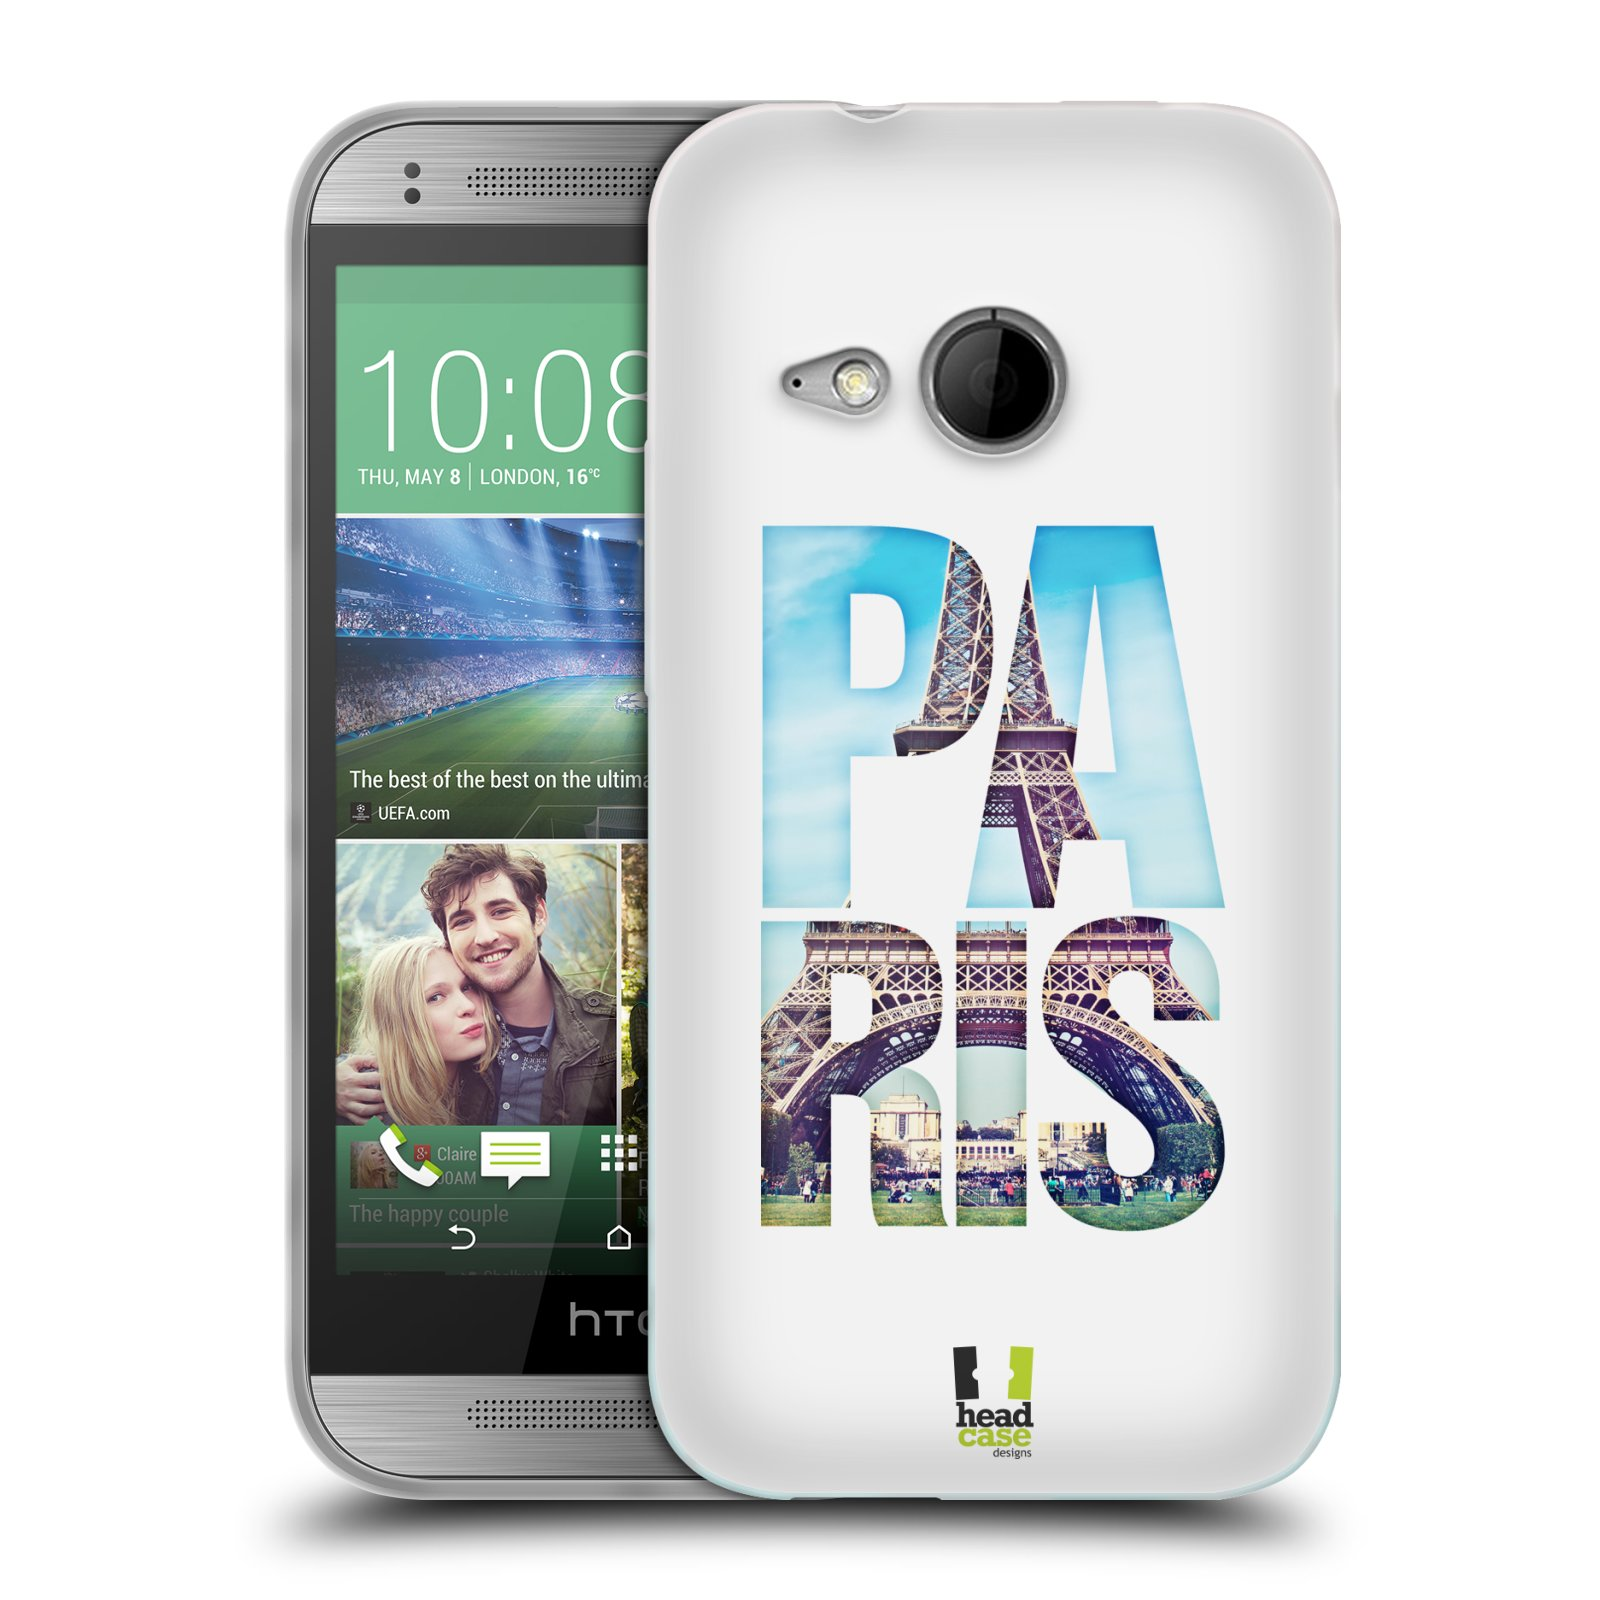 HEAD CASE silikonový obal na mobil HTC ONE MINI 2 vzor Města foto a nadpis FRANCIE, PAŘÍŽ, EIFFELOVA VĚŽ